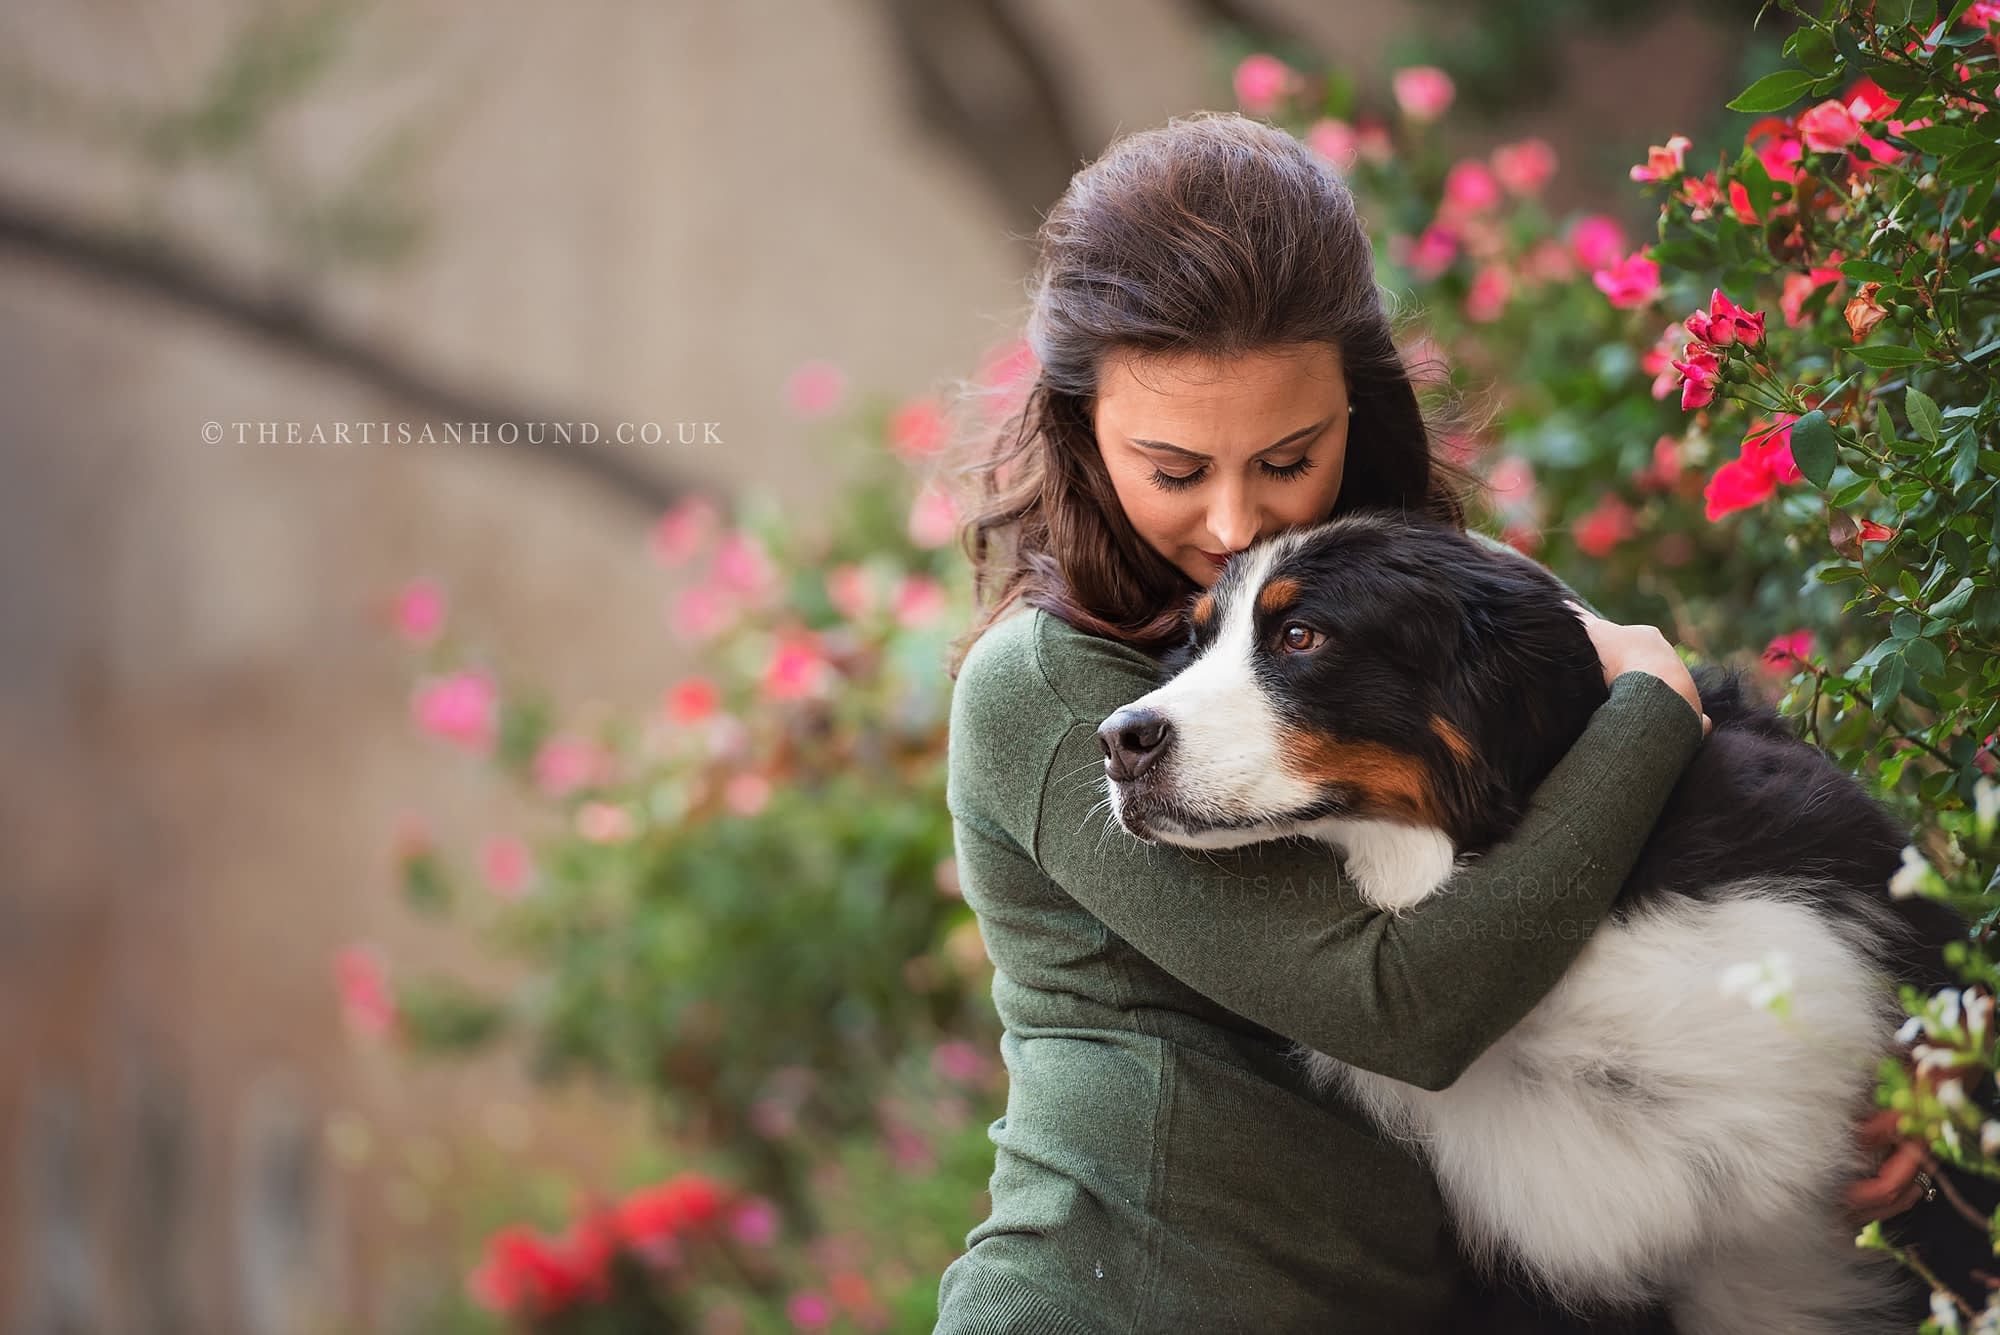 Owner hugging dog in flowers